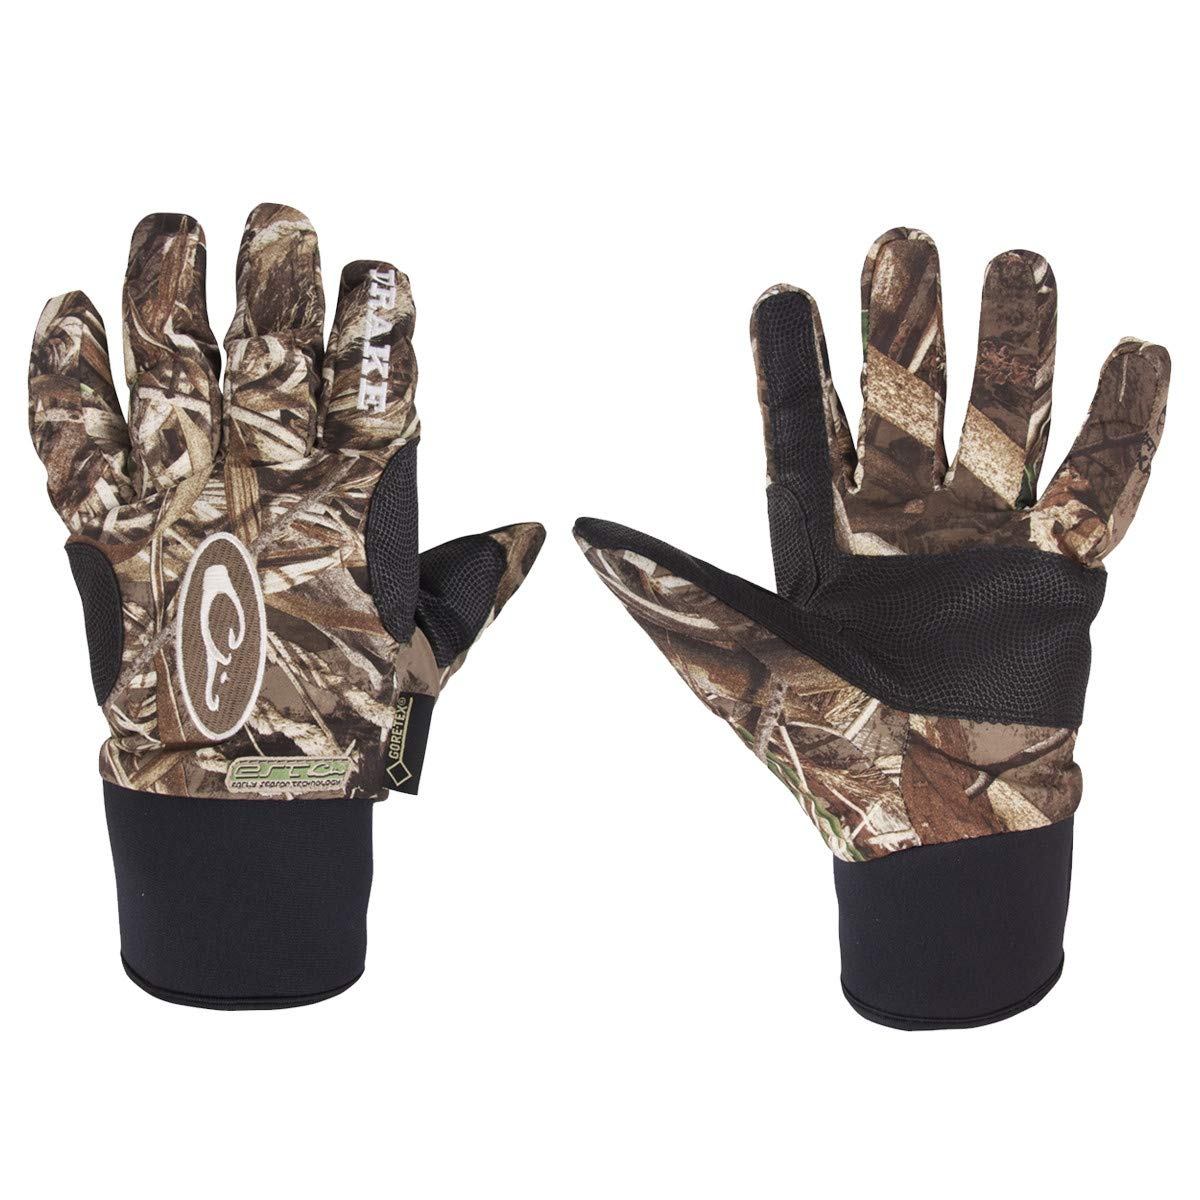 Drake Refuge HS Early Season Gore-Tex Glove-Mossy Oak Shadow Grass Blades-Large by Drake